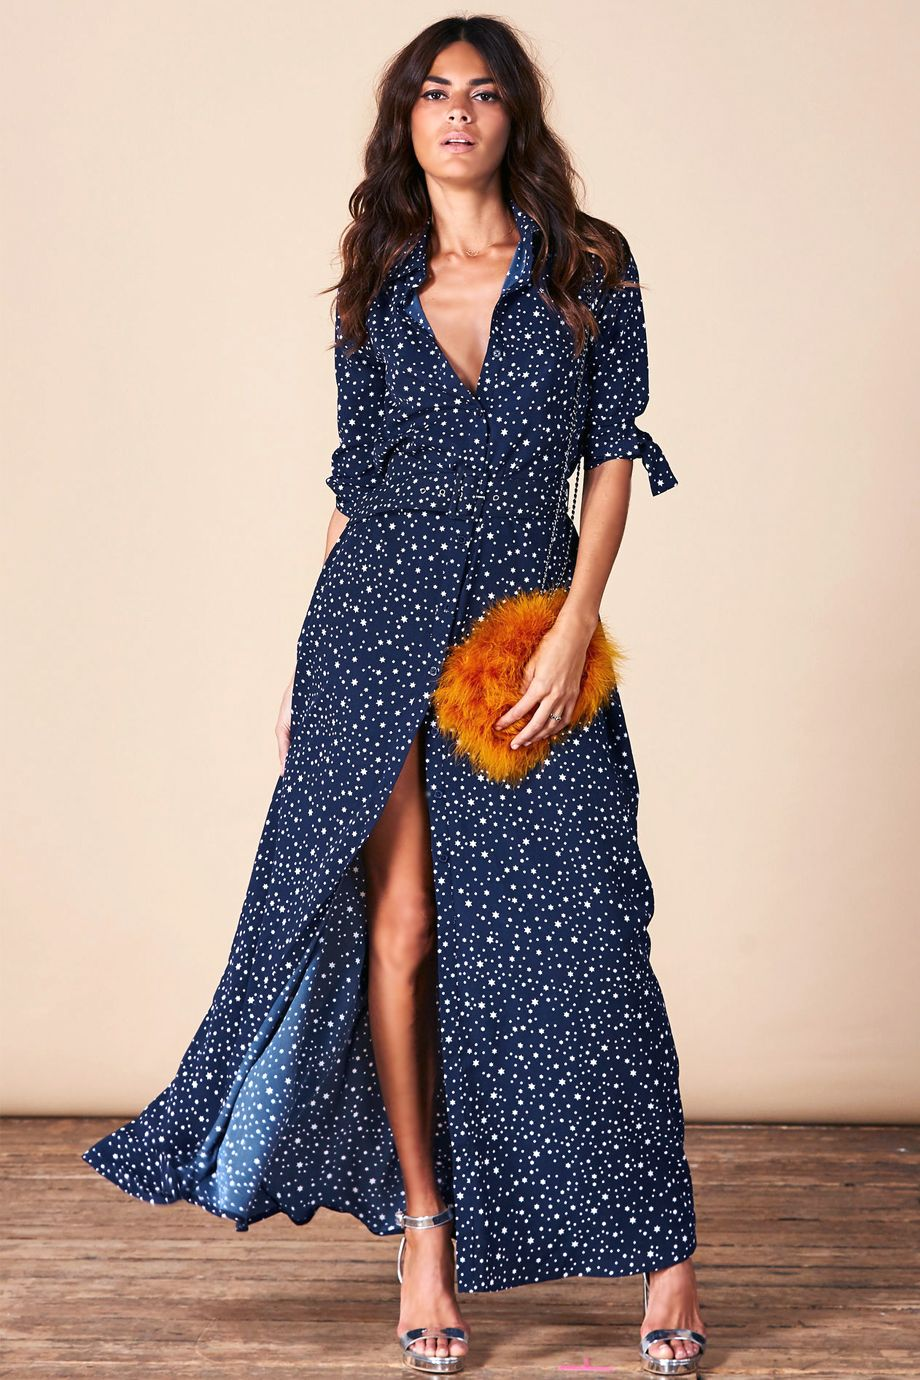 30cdfbca491a Σεμιζιε μπλε μαξι φορεμα με λευκα αστερακια